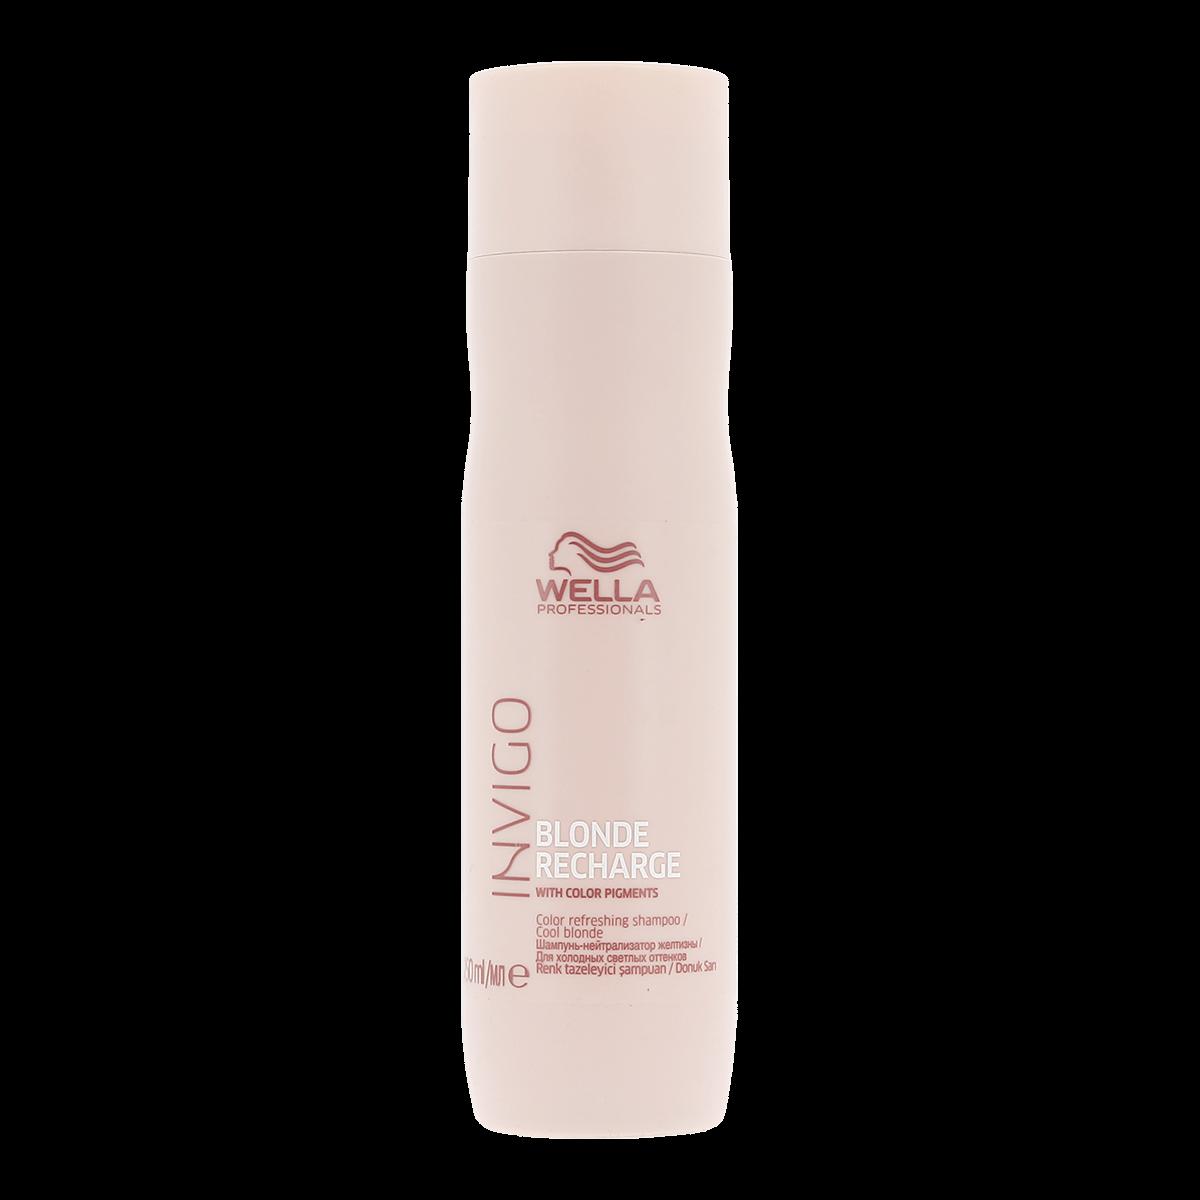 Wella Invigo Blonde Recharge Cool Blonde Shampoo 250ml e84791b54f6